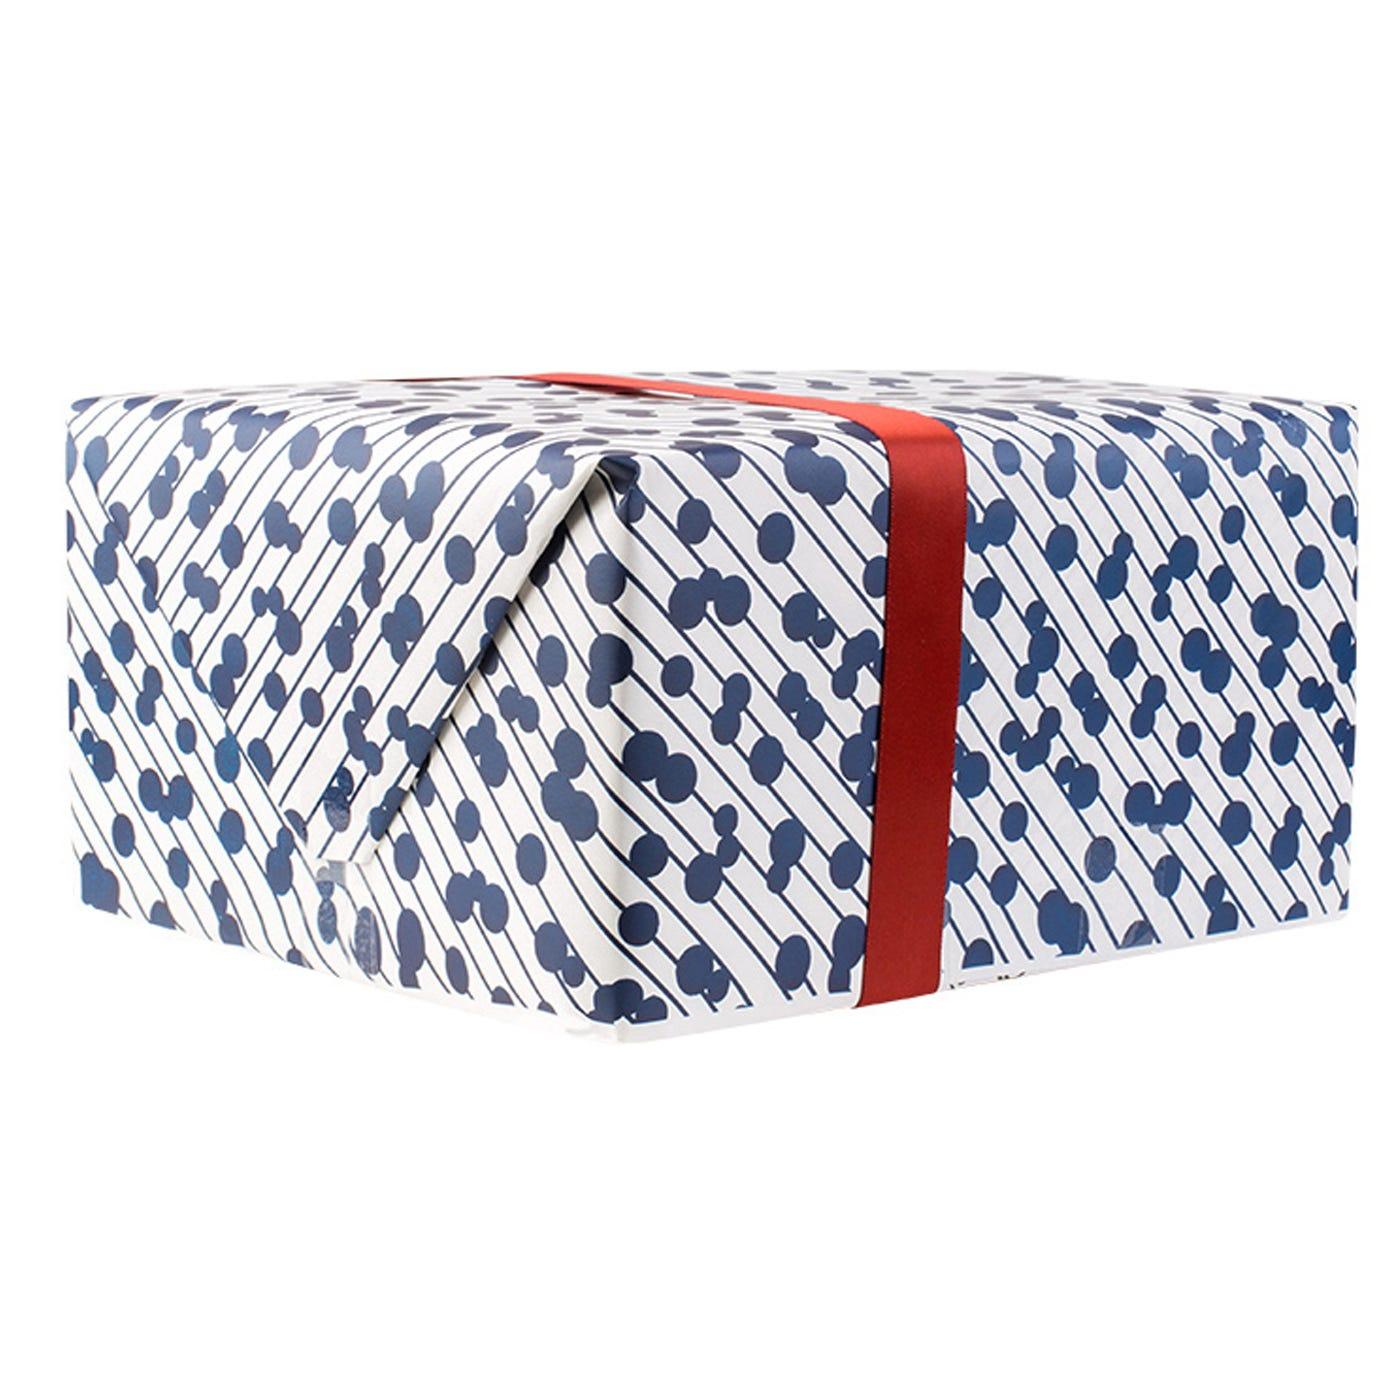 Bocci Chandelier Gift Wrap Blue